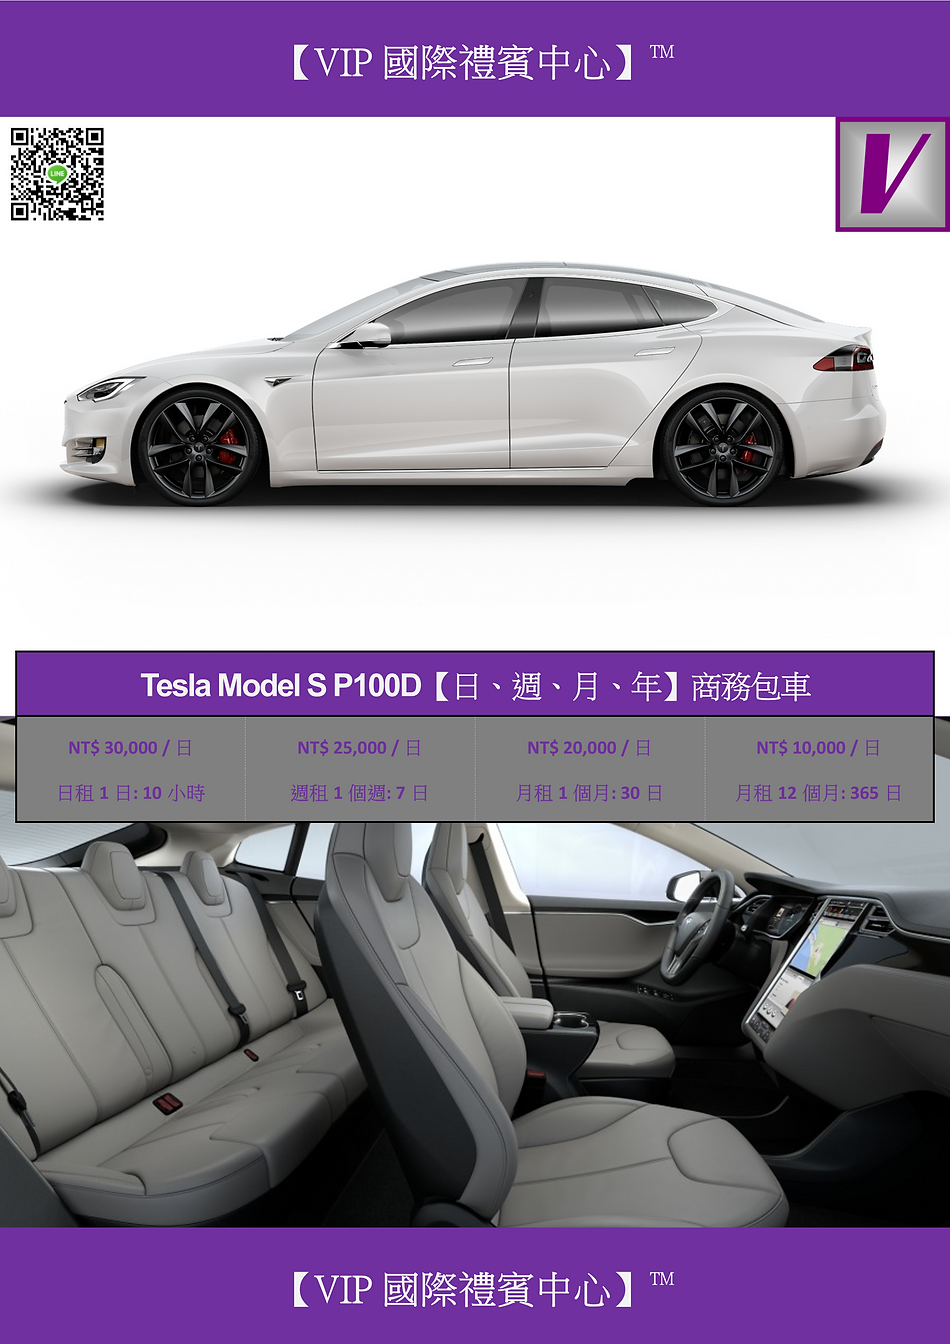 VIP國際禮賓中心 TESLA MODEL S P100D 臺北市區接送包車